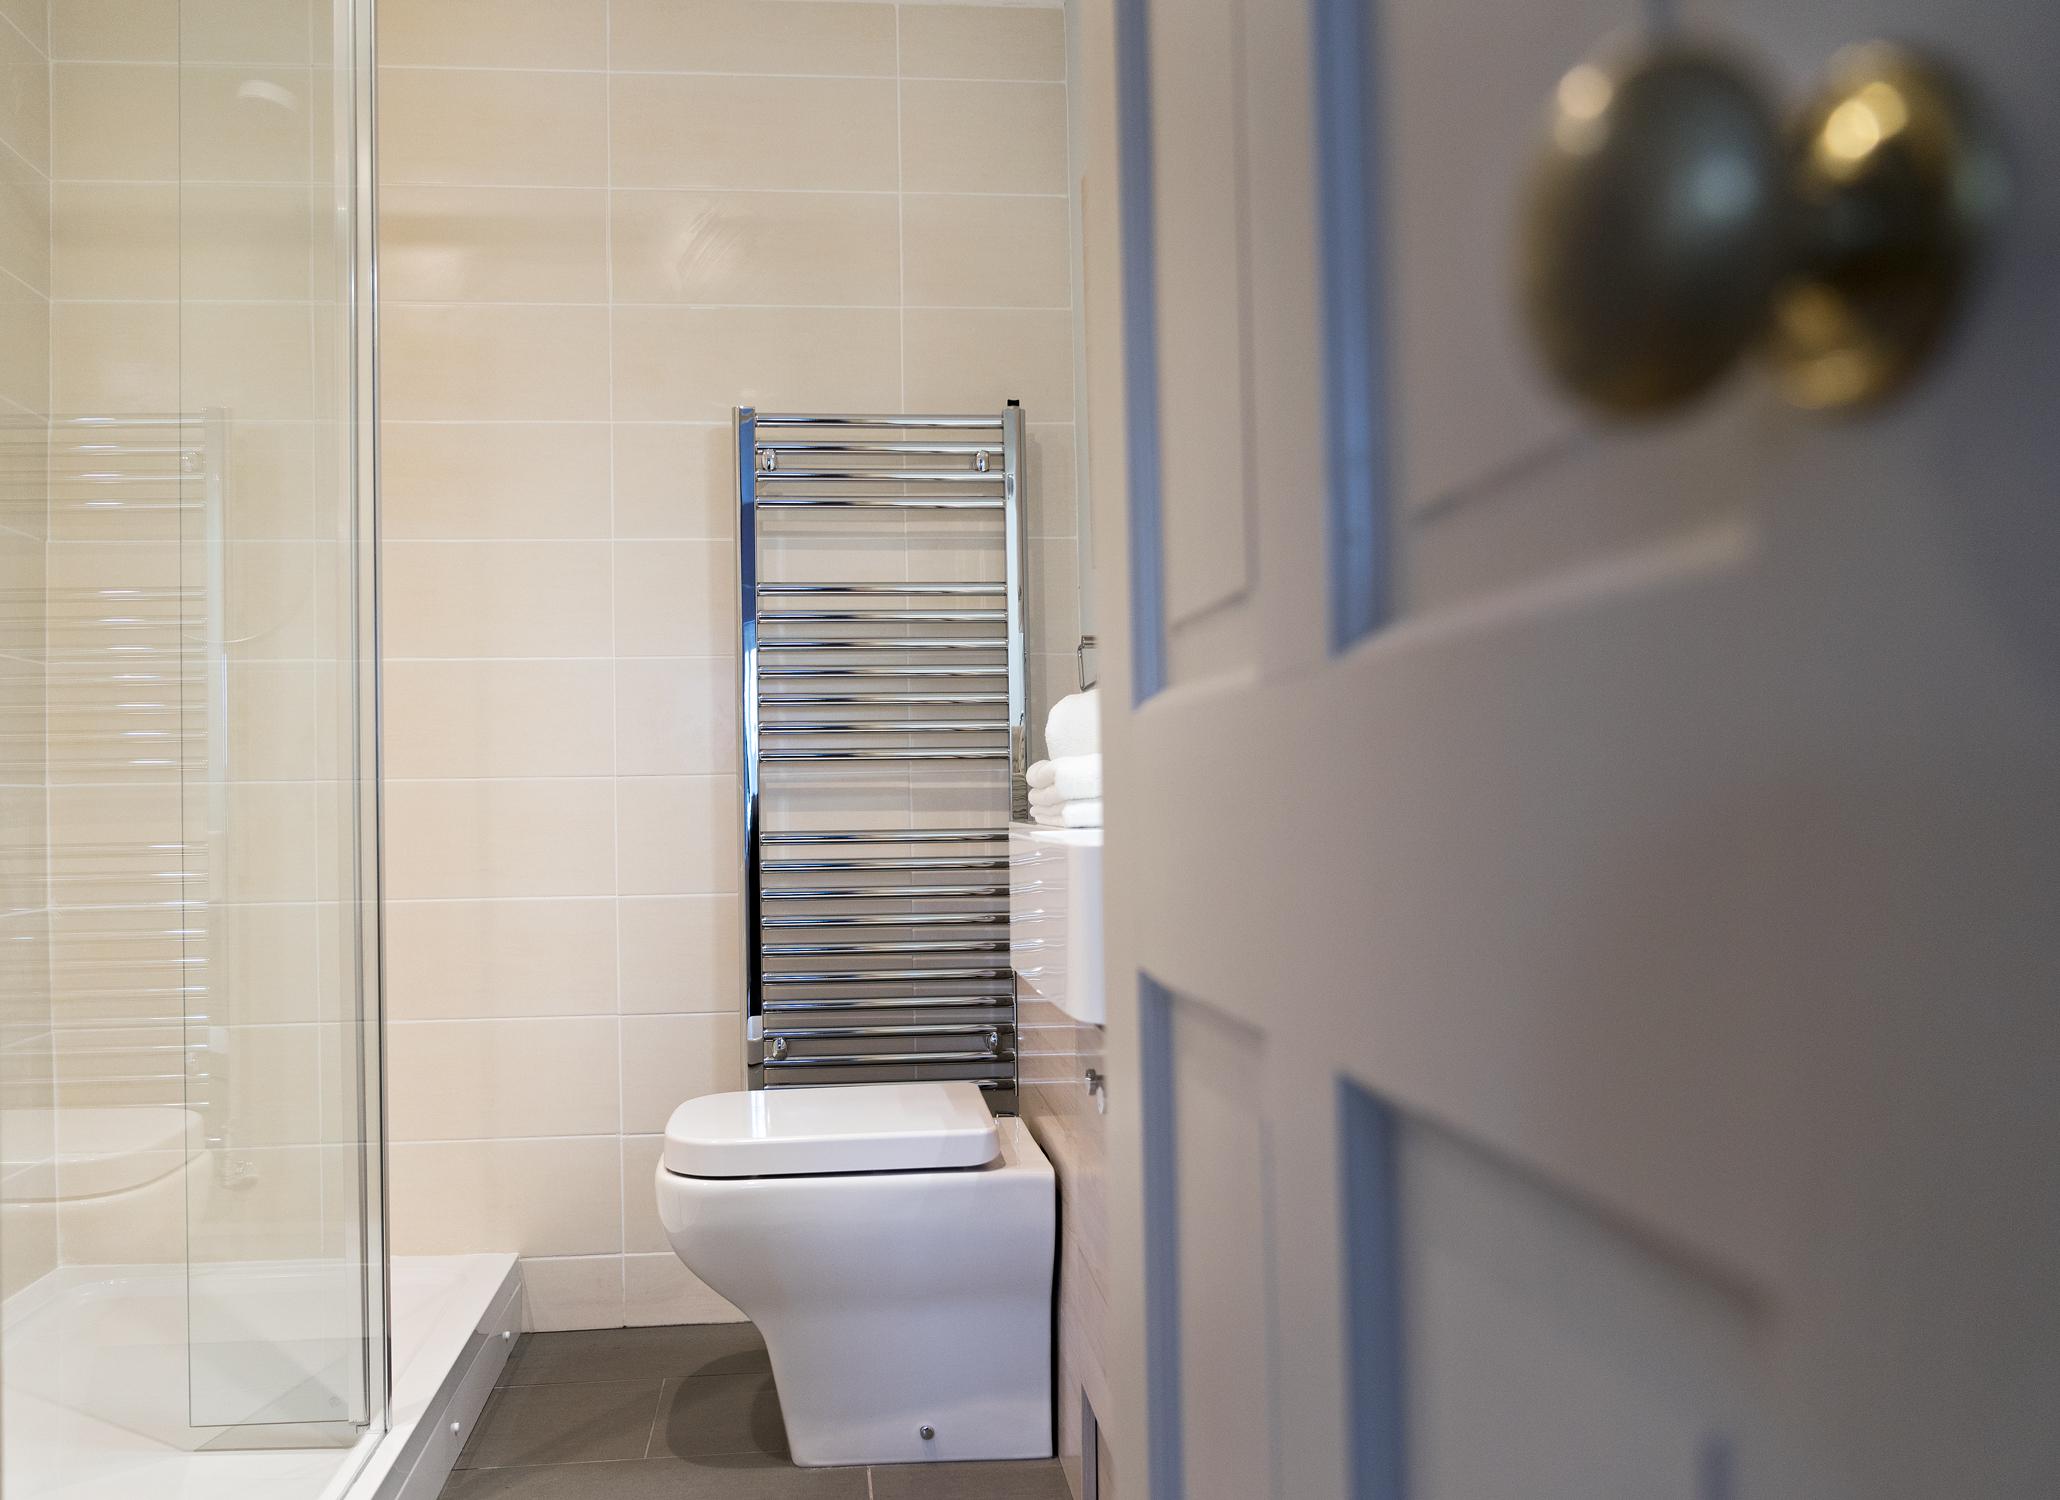 Courtyard Suite Walkin Shower & WC